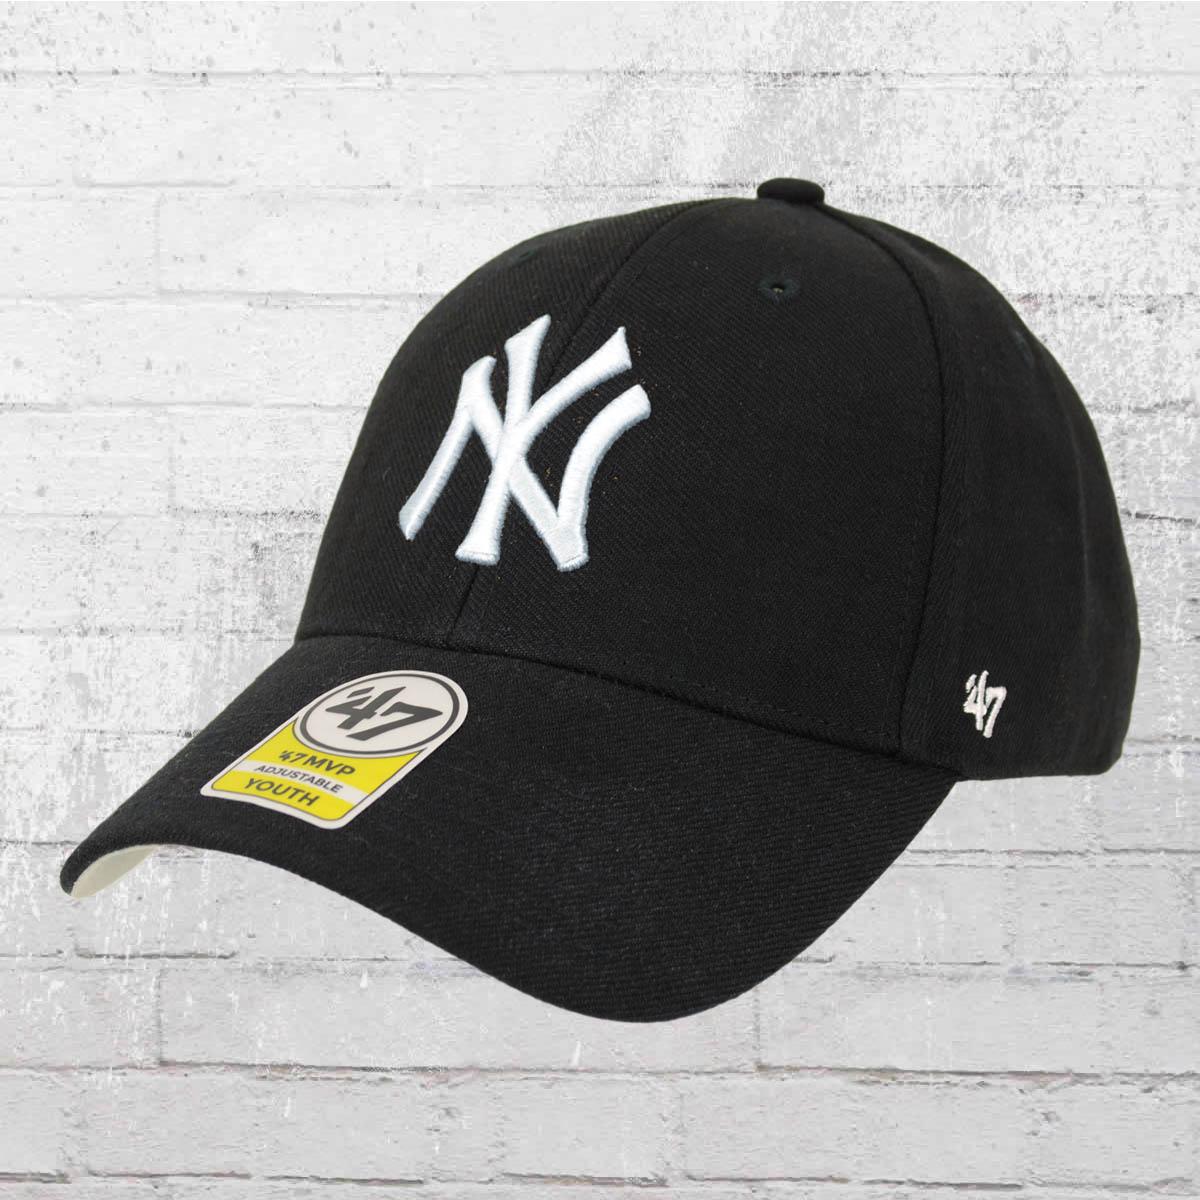 bd16e167f0f79 47 Brand Kids MLB Team Hat NY Yankees Cap black. ›‹ «